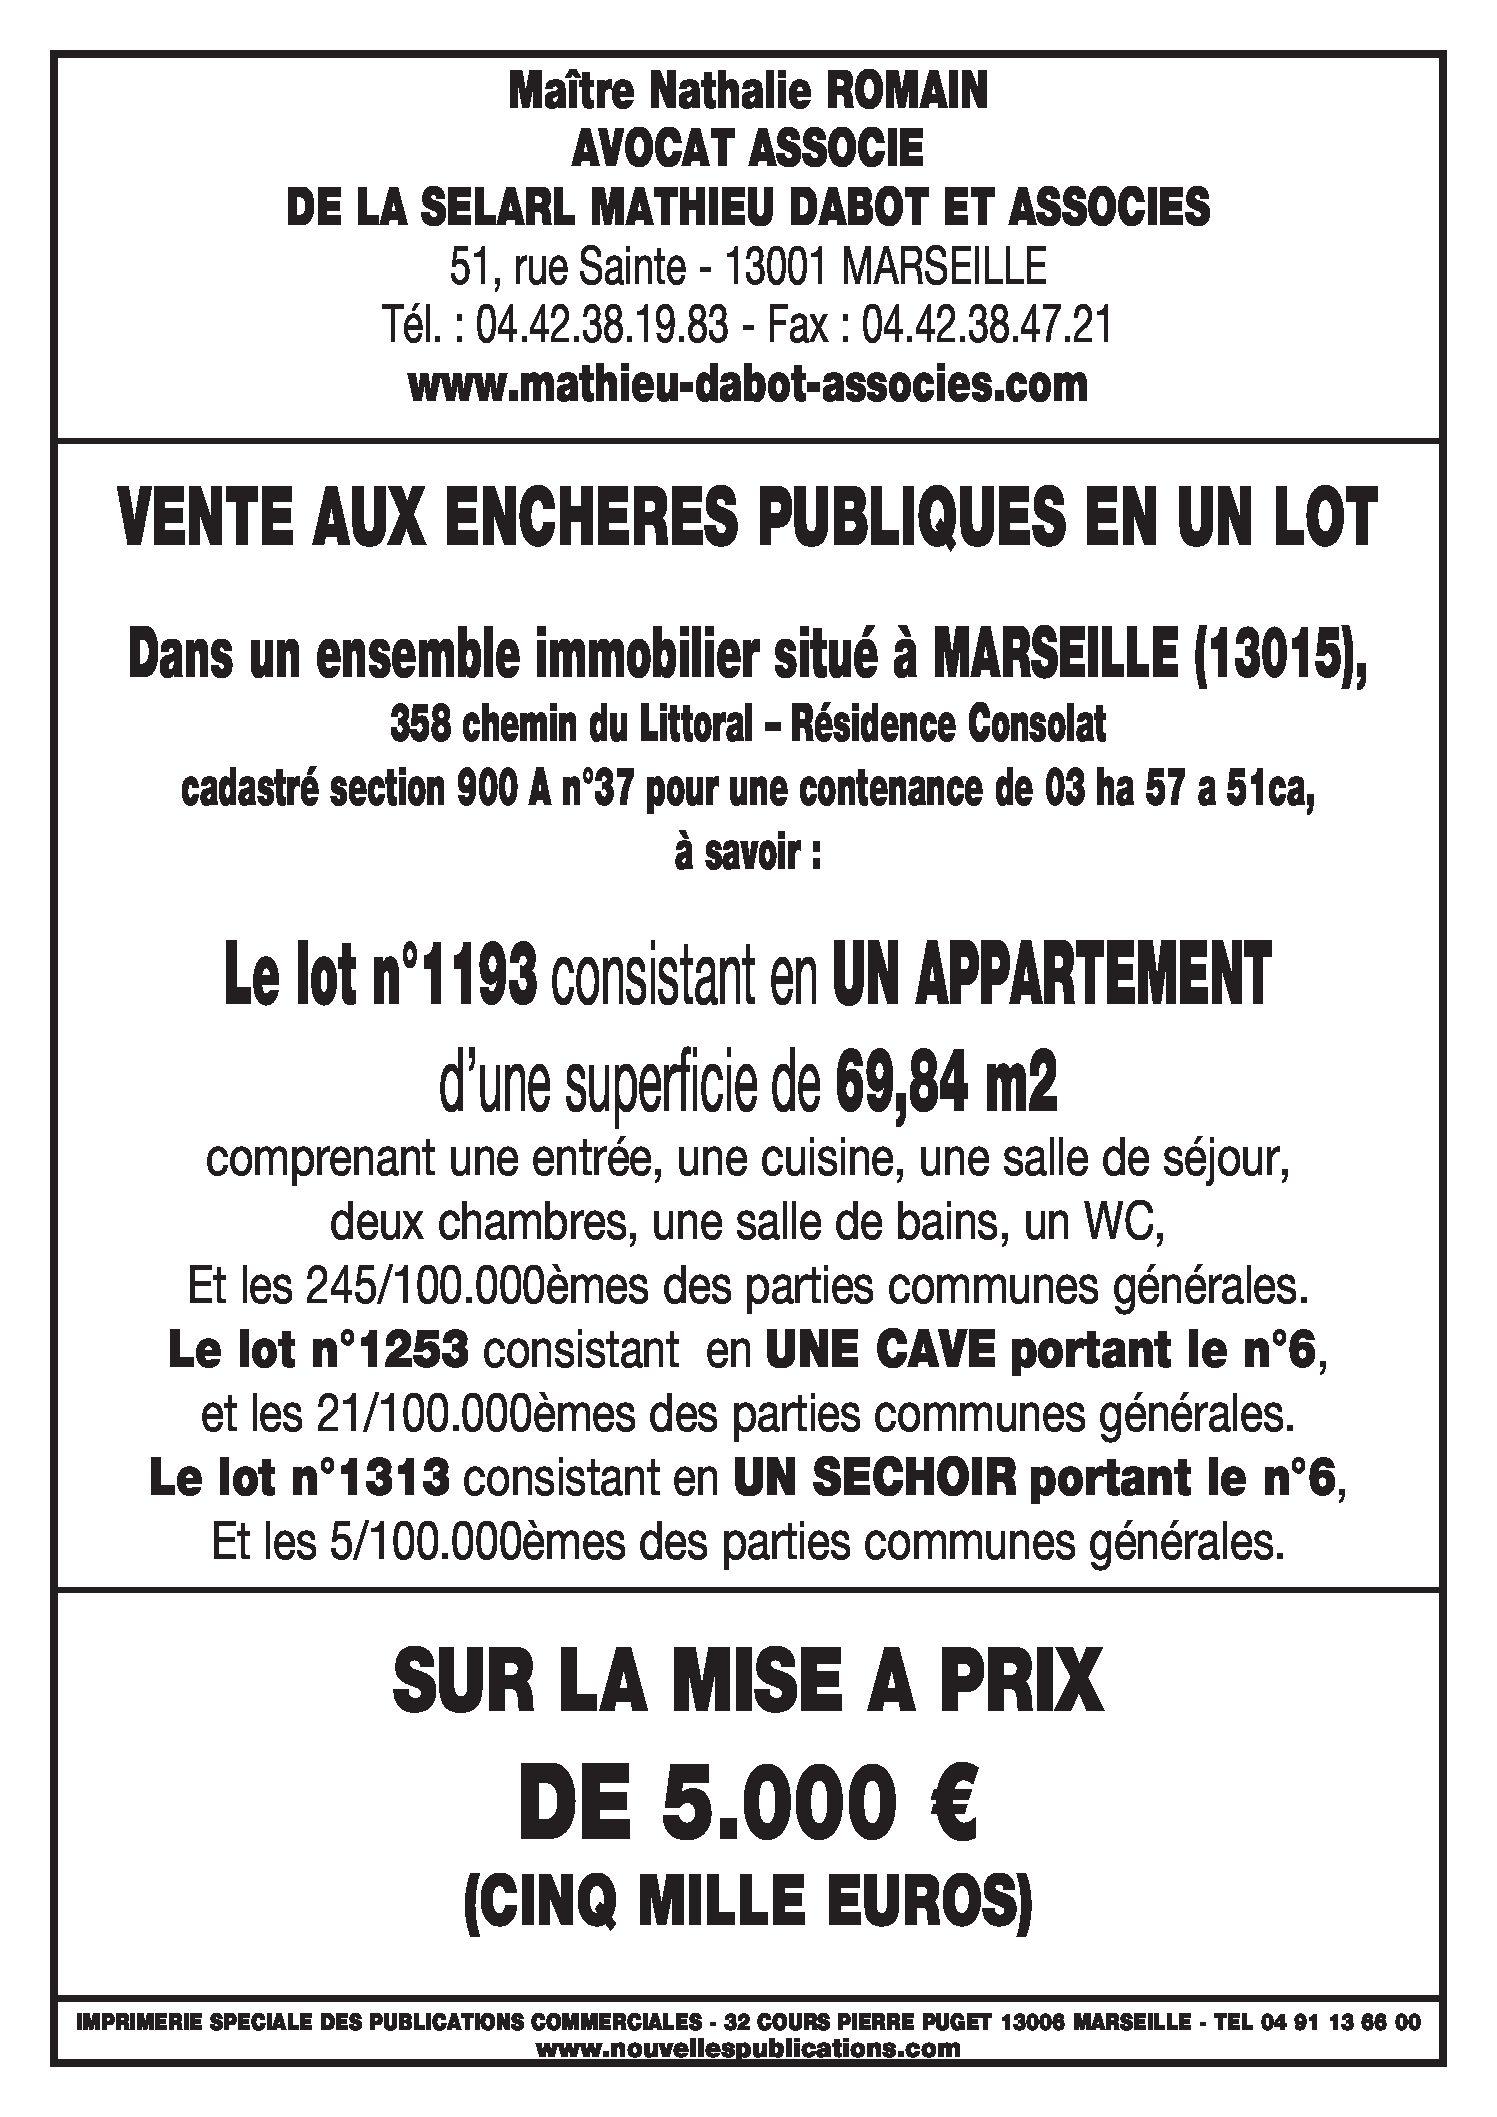 Affiche ADJ0210916_AFF03_SEM28 (1)